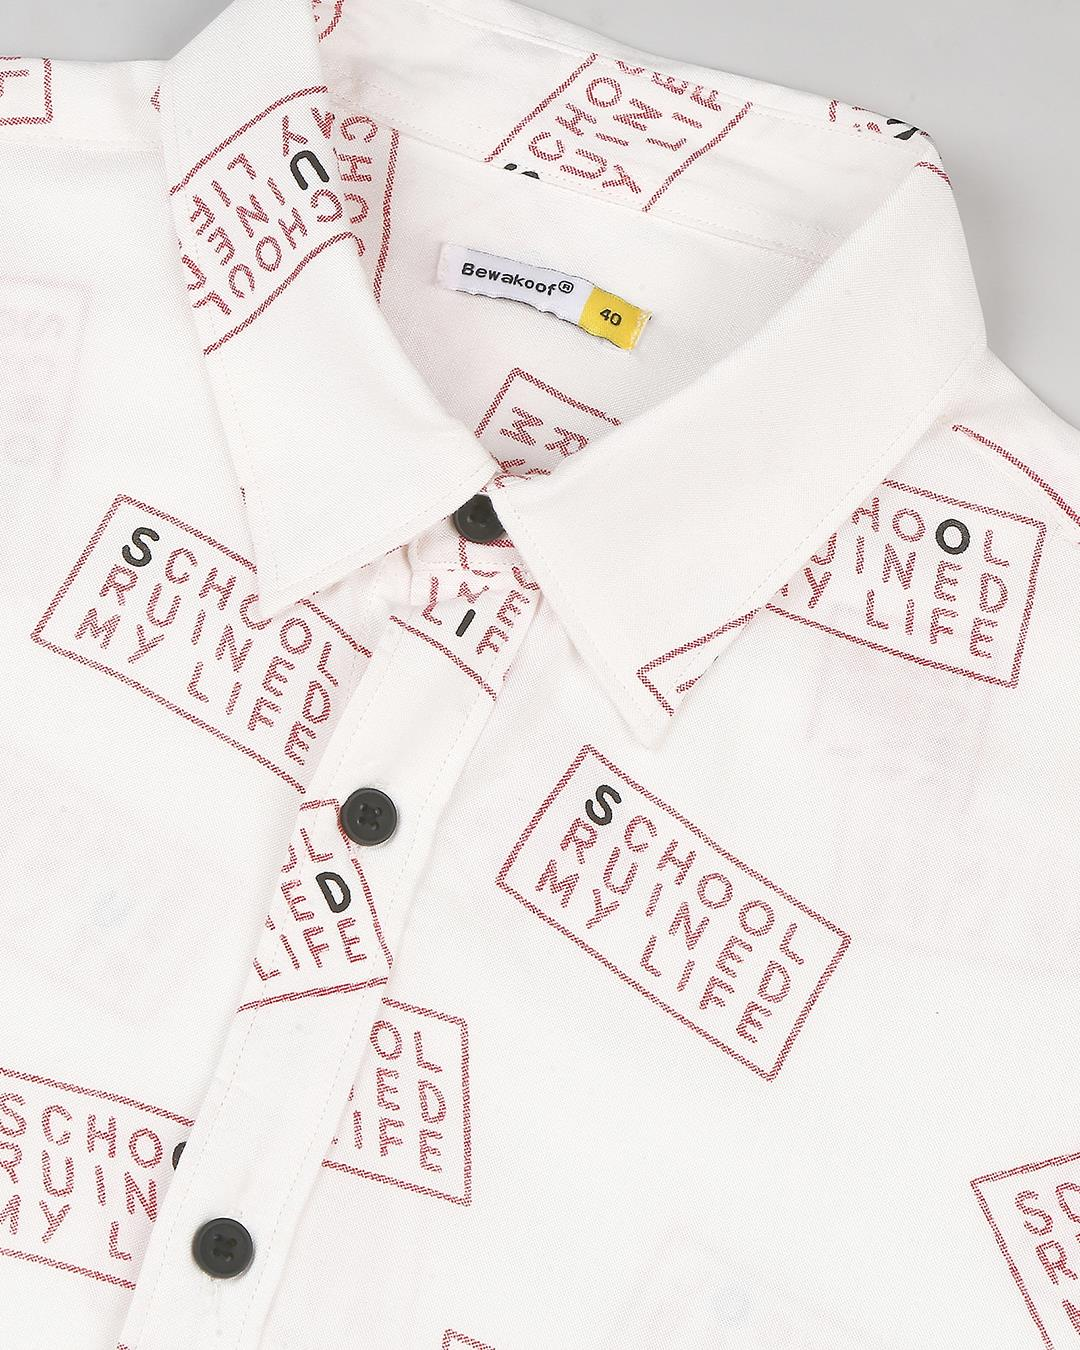 ShopSchool Ruined My Life Shirt